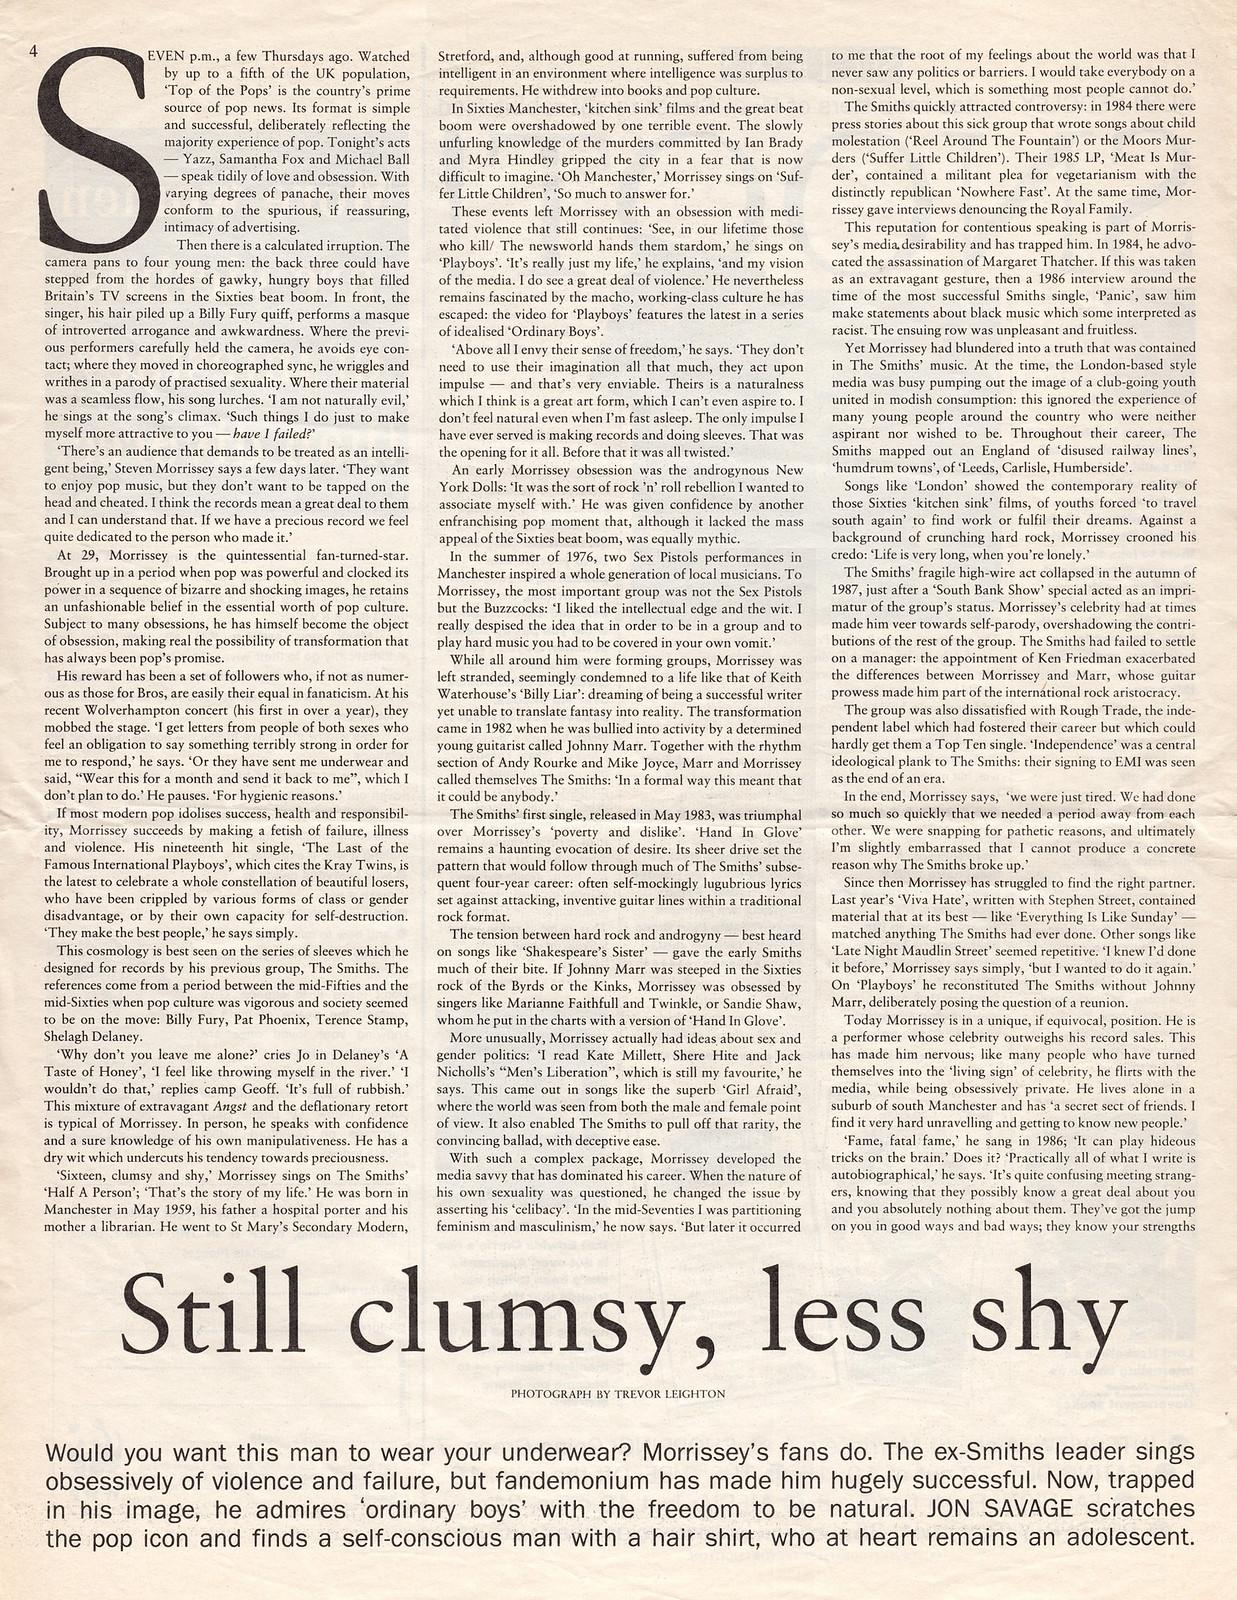 Morrissey Observer March 1989 p1.jpg